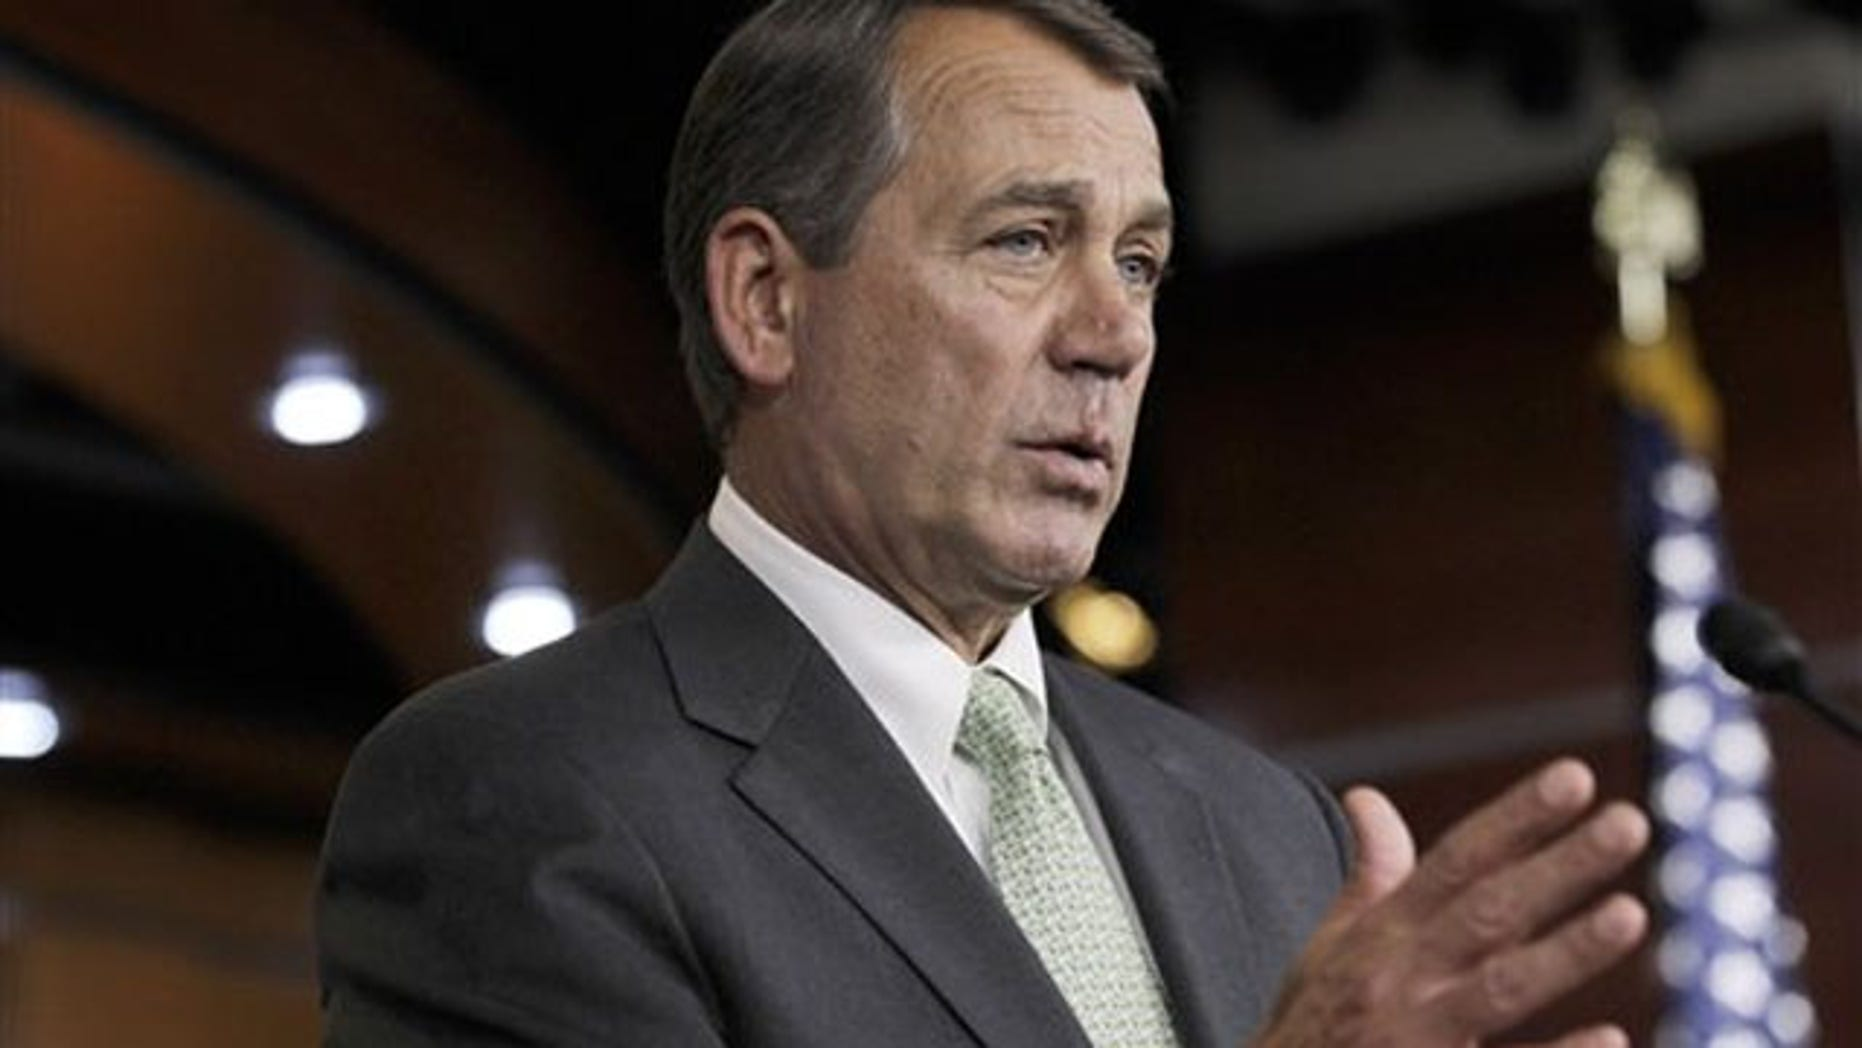 House Speaker John Boehner gestures during a news conference on Capitol Hill in Washington Jan. 26.